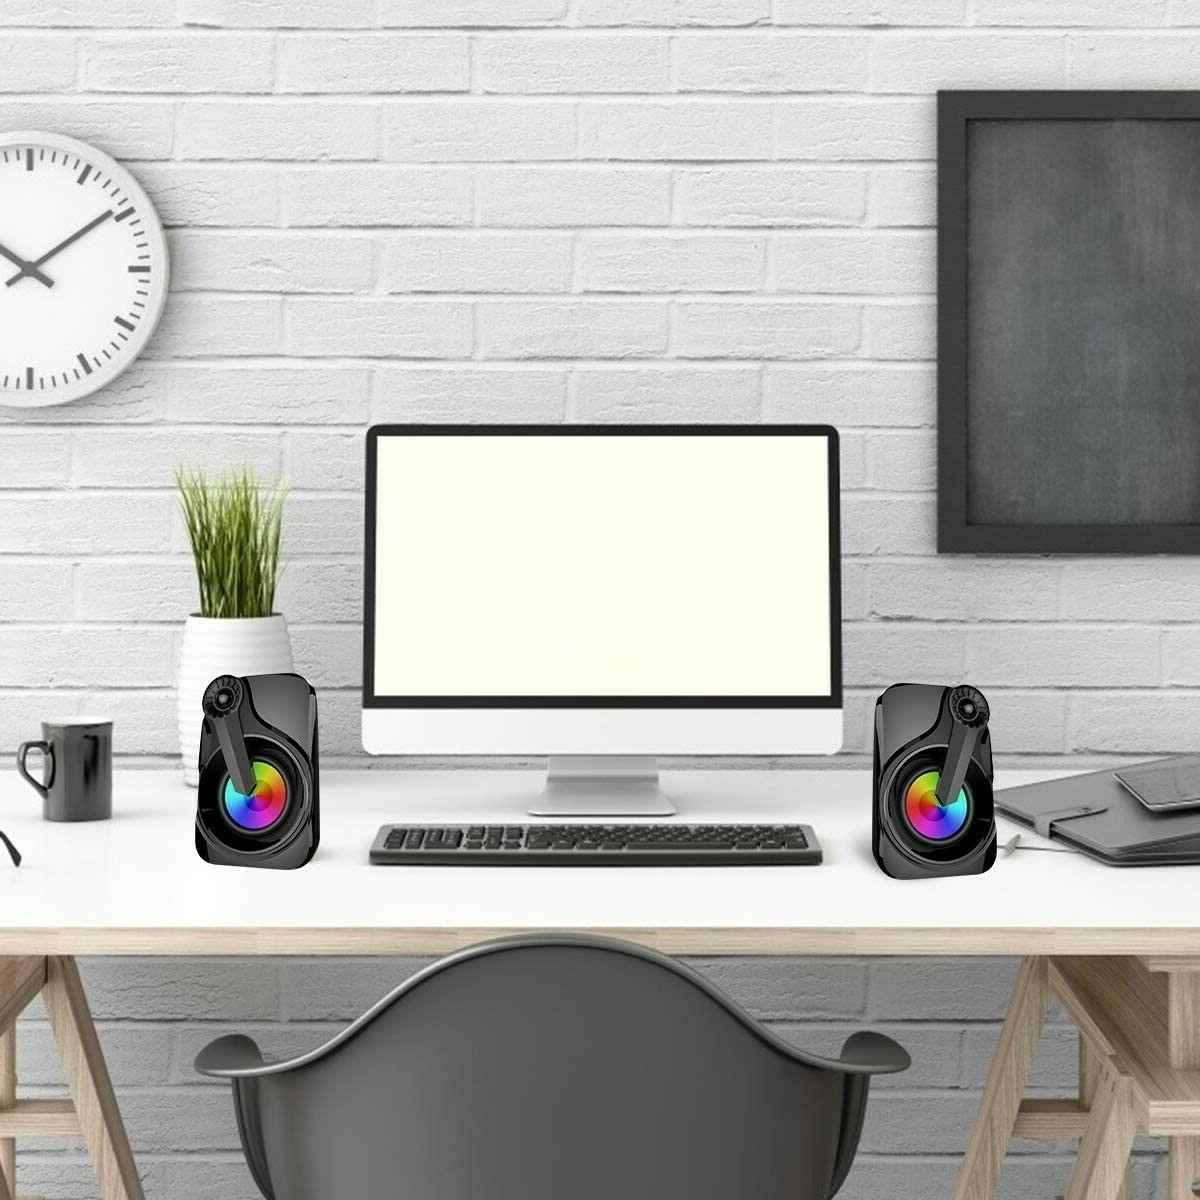 Maboo Bar Speakers Computer Desktop RGB